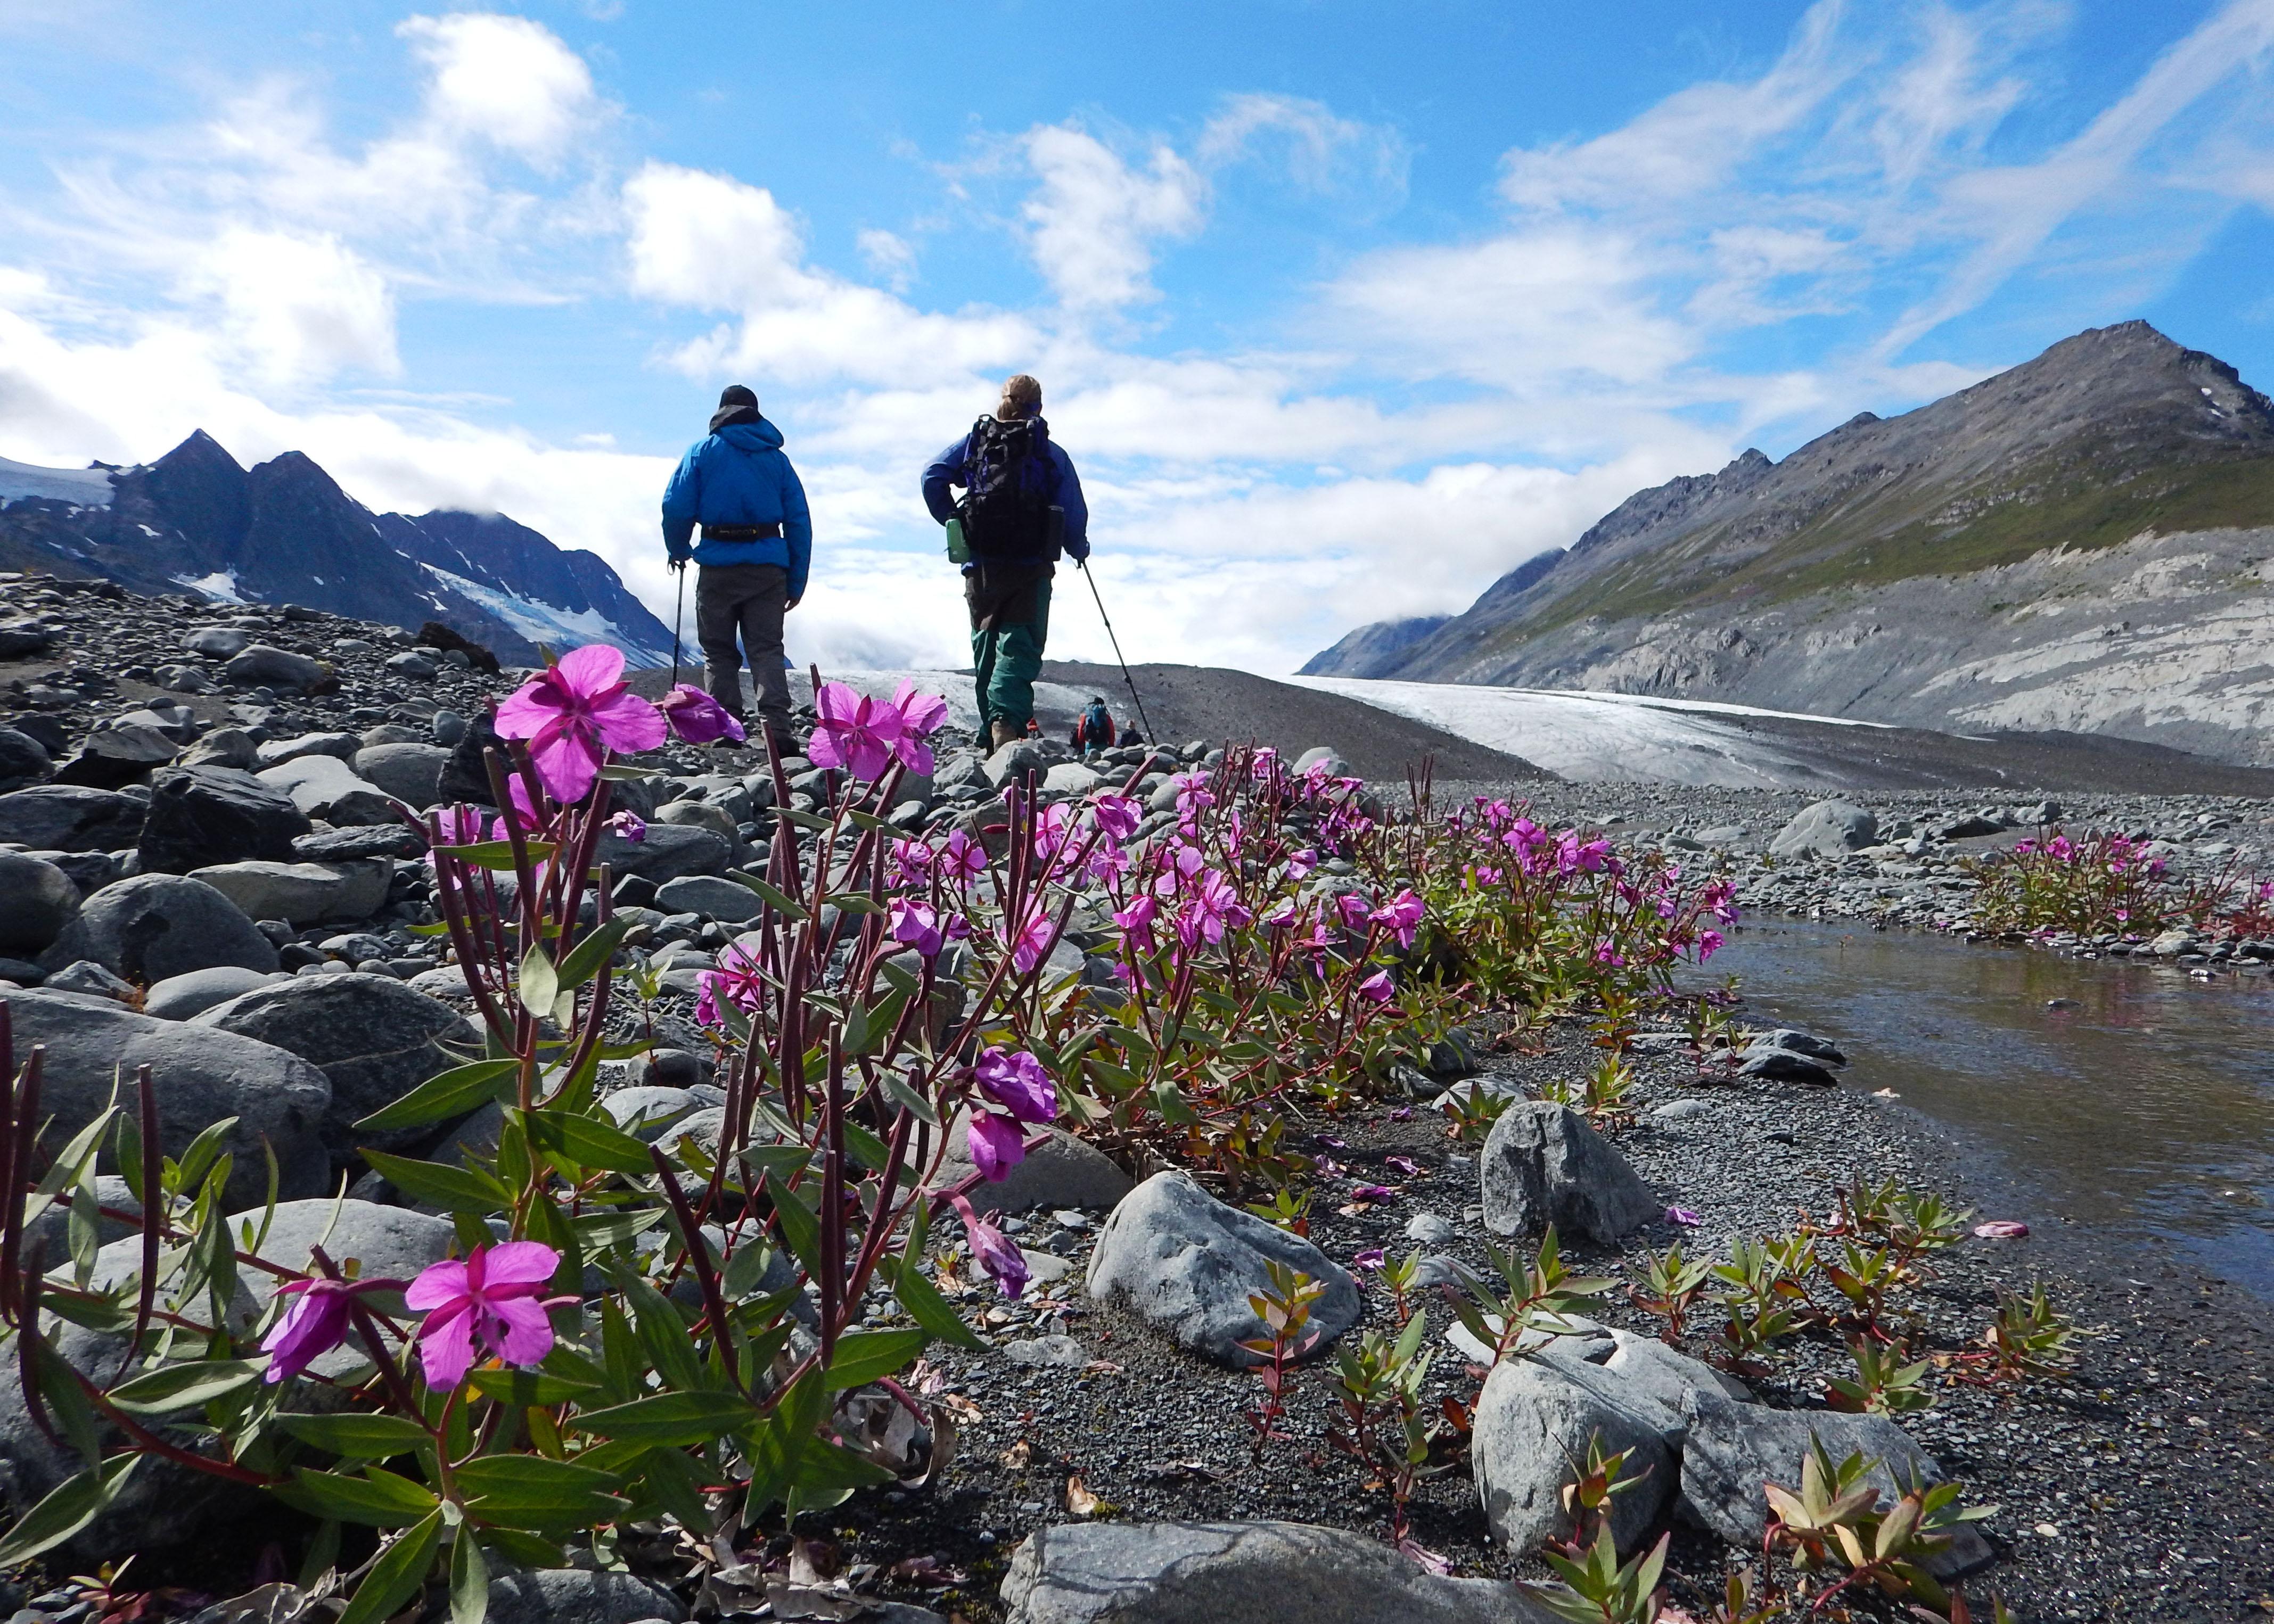 Hiking near a glacier in Alaska Photo by Liz Schultz